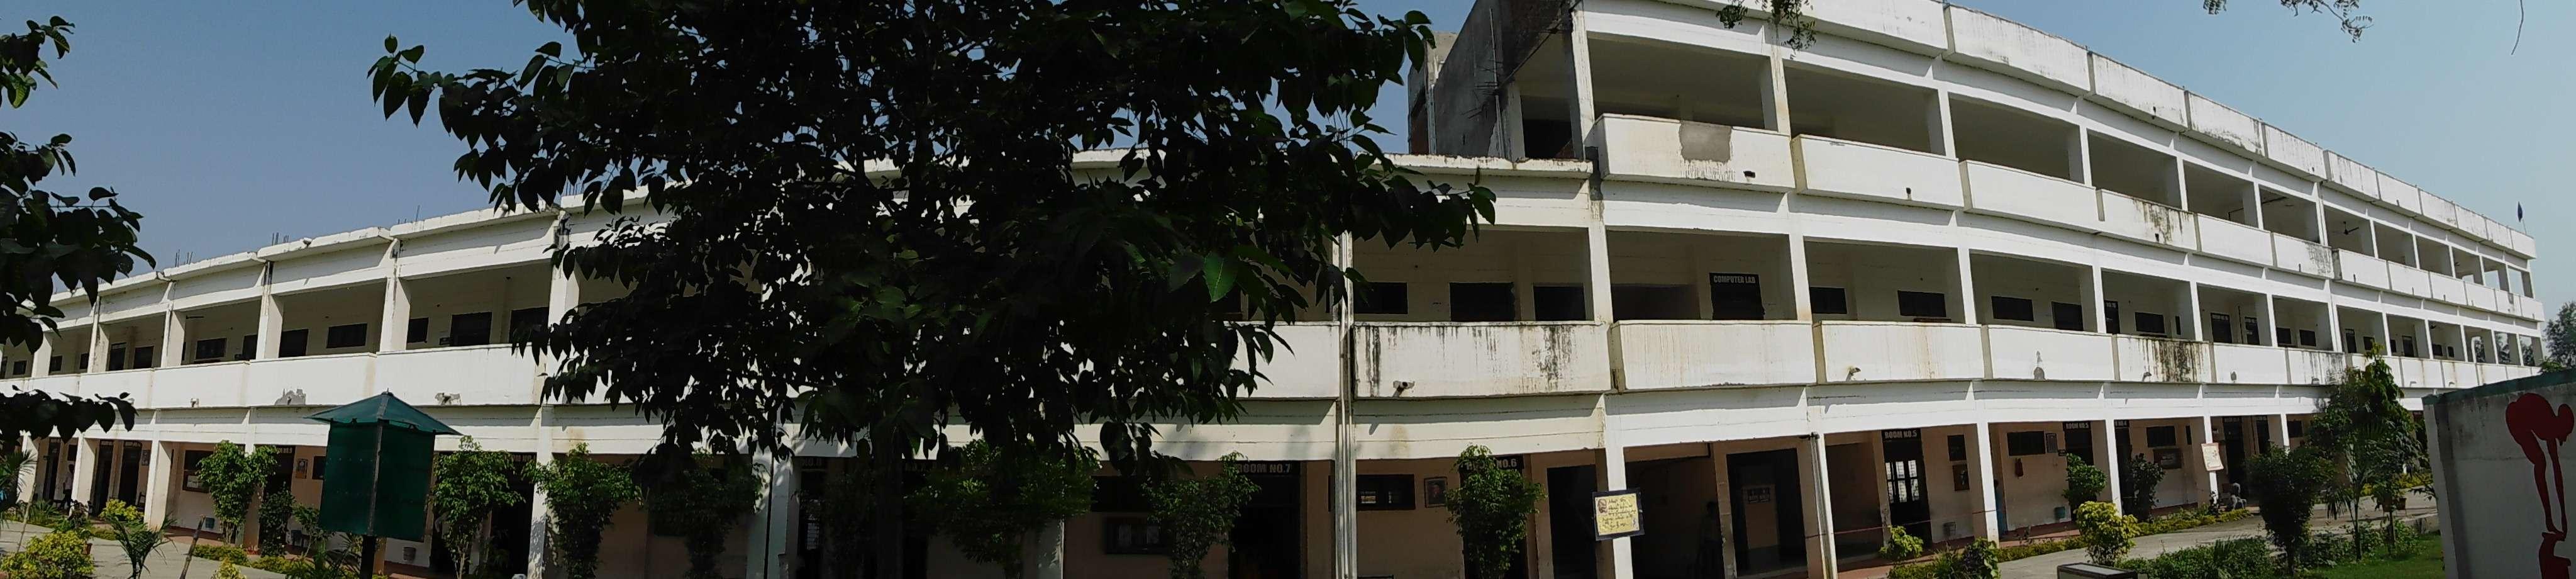 S J S PUBLIC SCHOOL CH SHAHUJI MAHARAJ NAGAR uttar pradesh 2131629